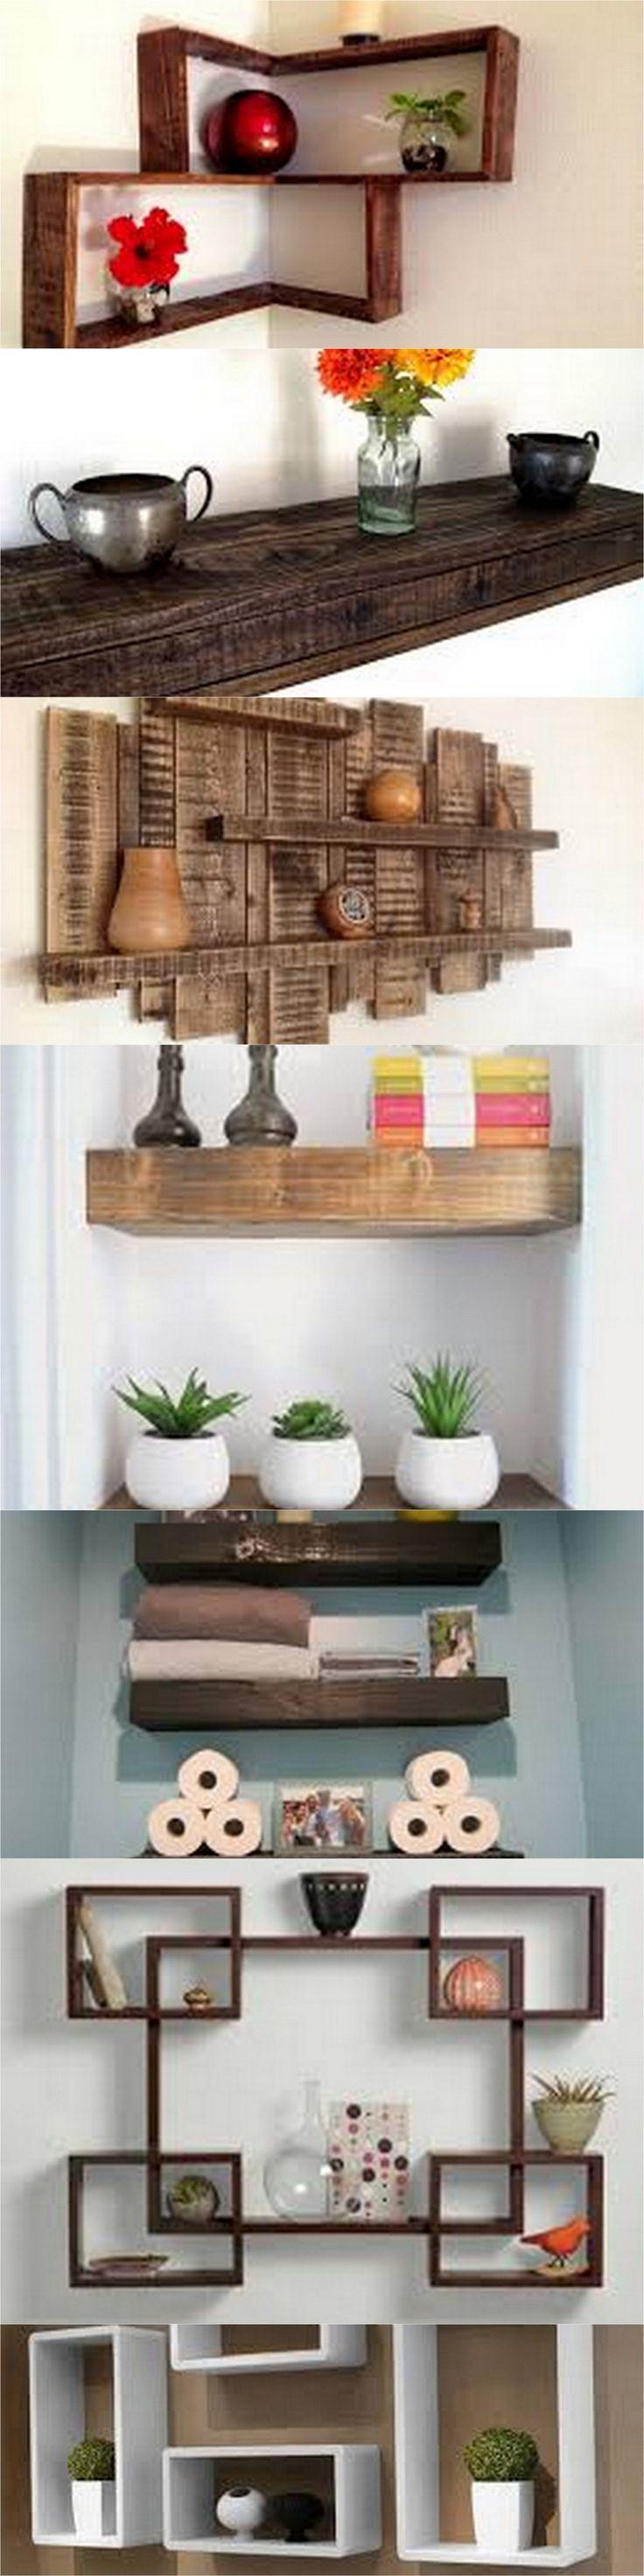 DIY Pallet Shelves ideas 4278 best Projets